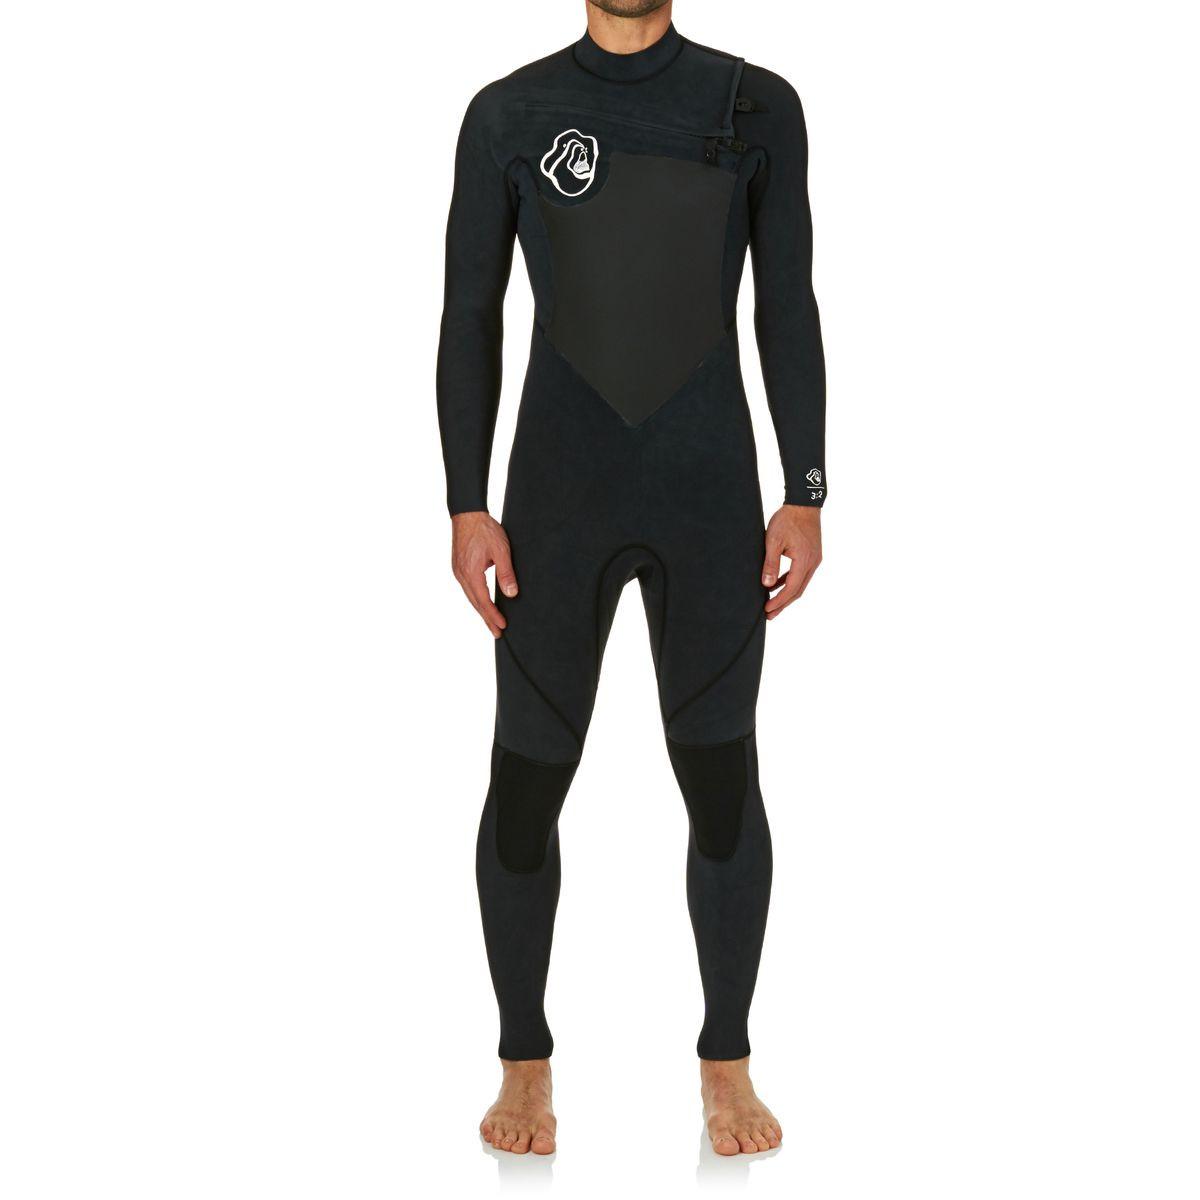 Quiksilver High Dye 3/2mm 2017 Chest Zip Wetsuit - Black